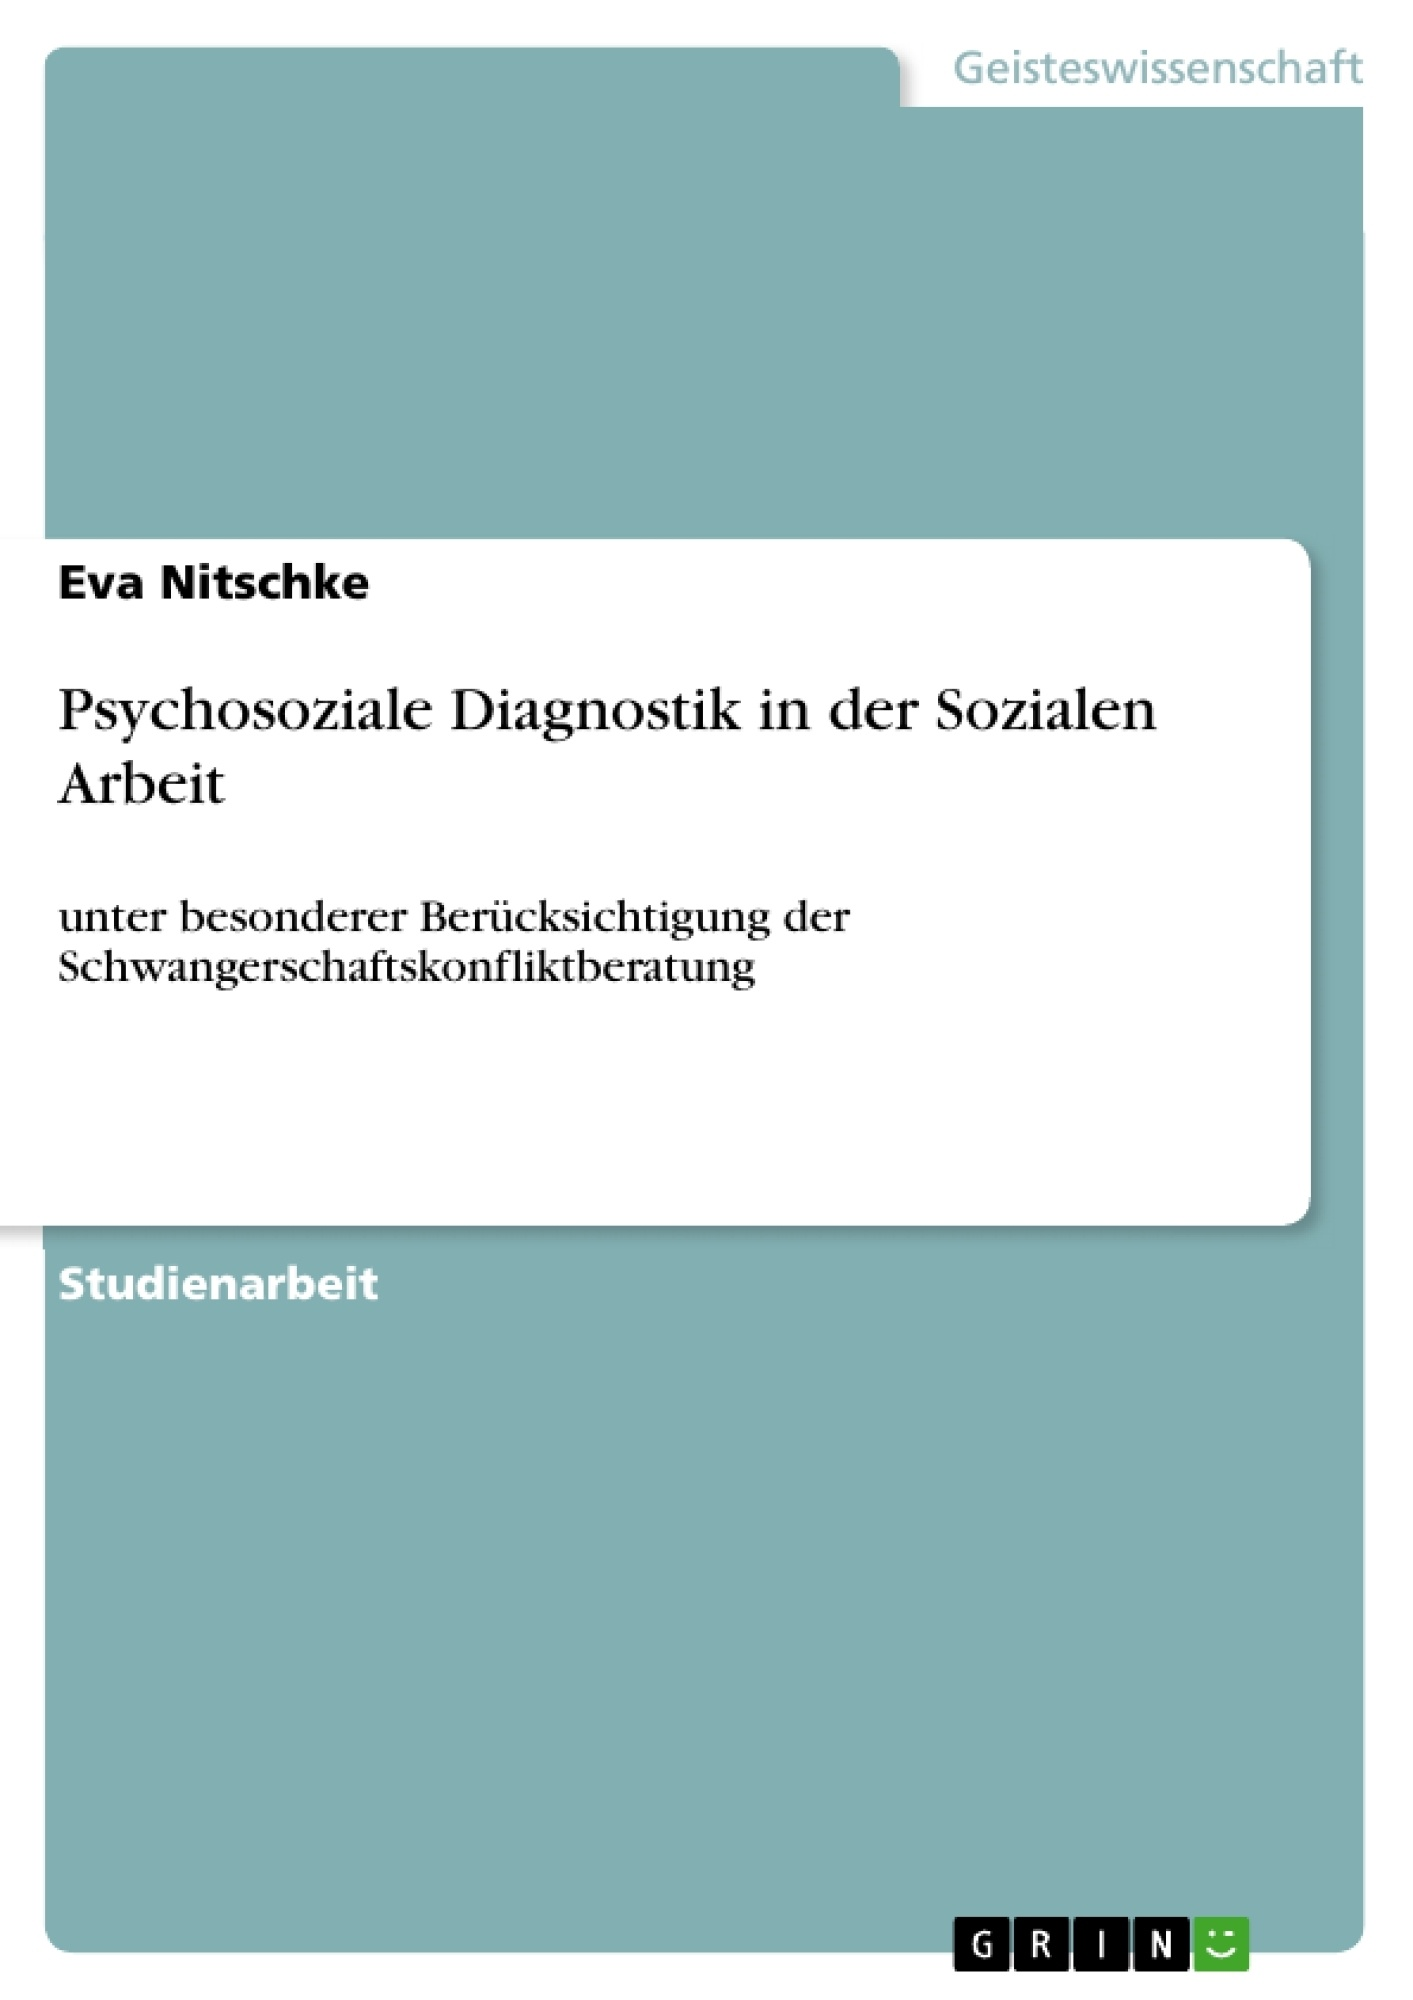 Titel: Psychosoziale Diagnostik in der Sozialen Arbeit